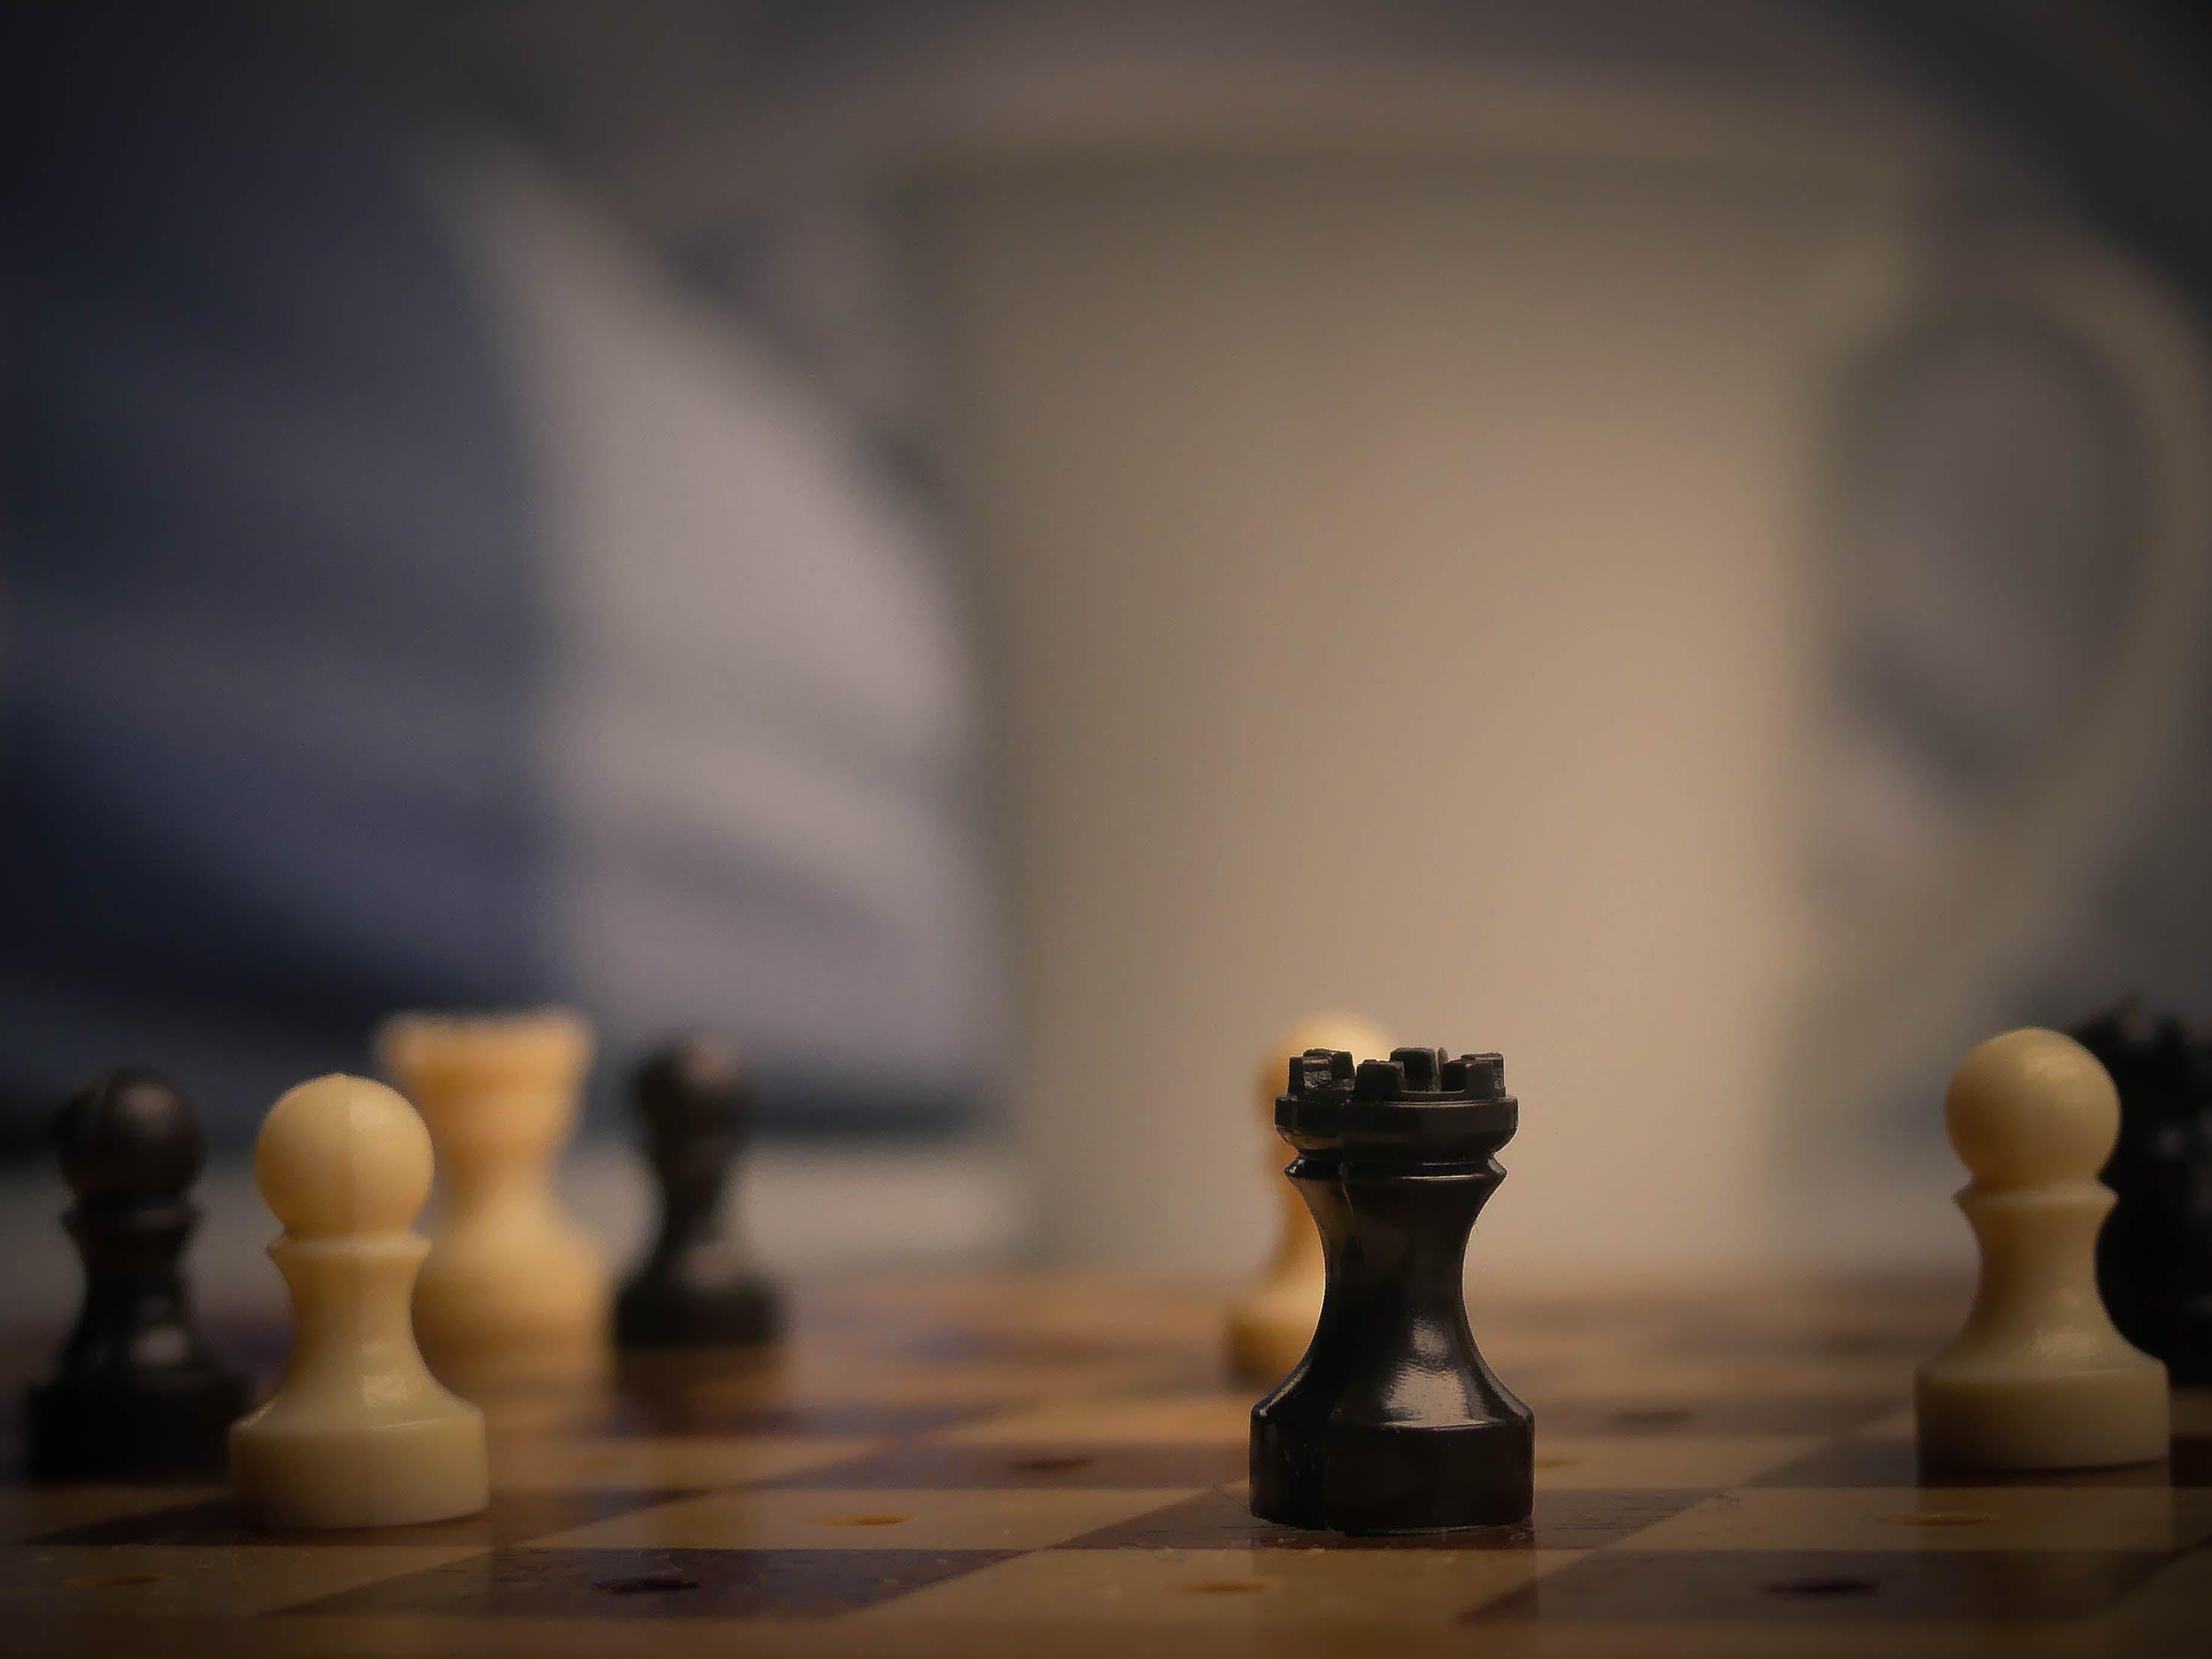 Free stock photo of #carpet, #chess, #conversation, #cub